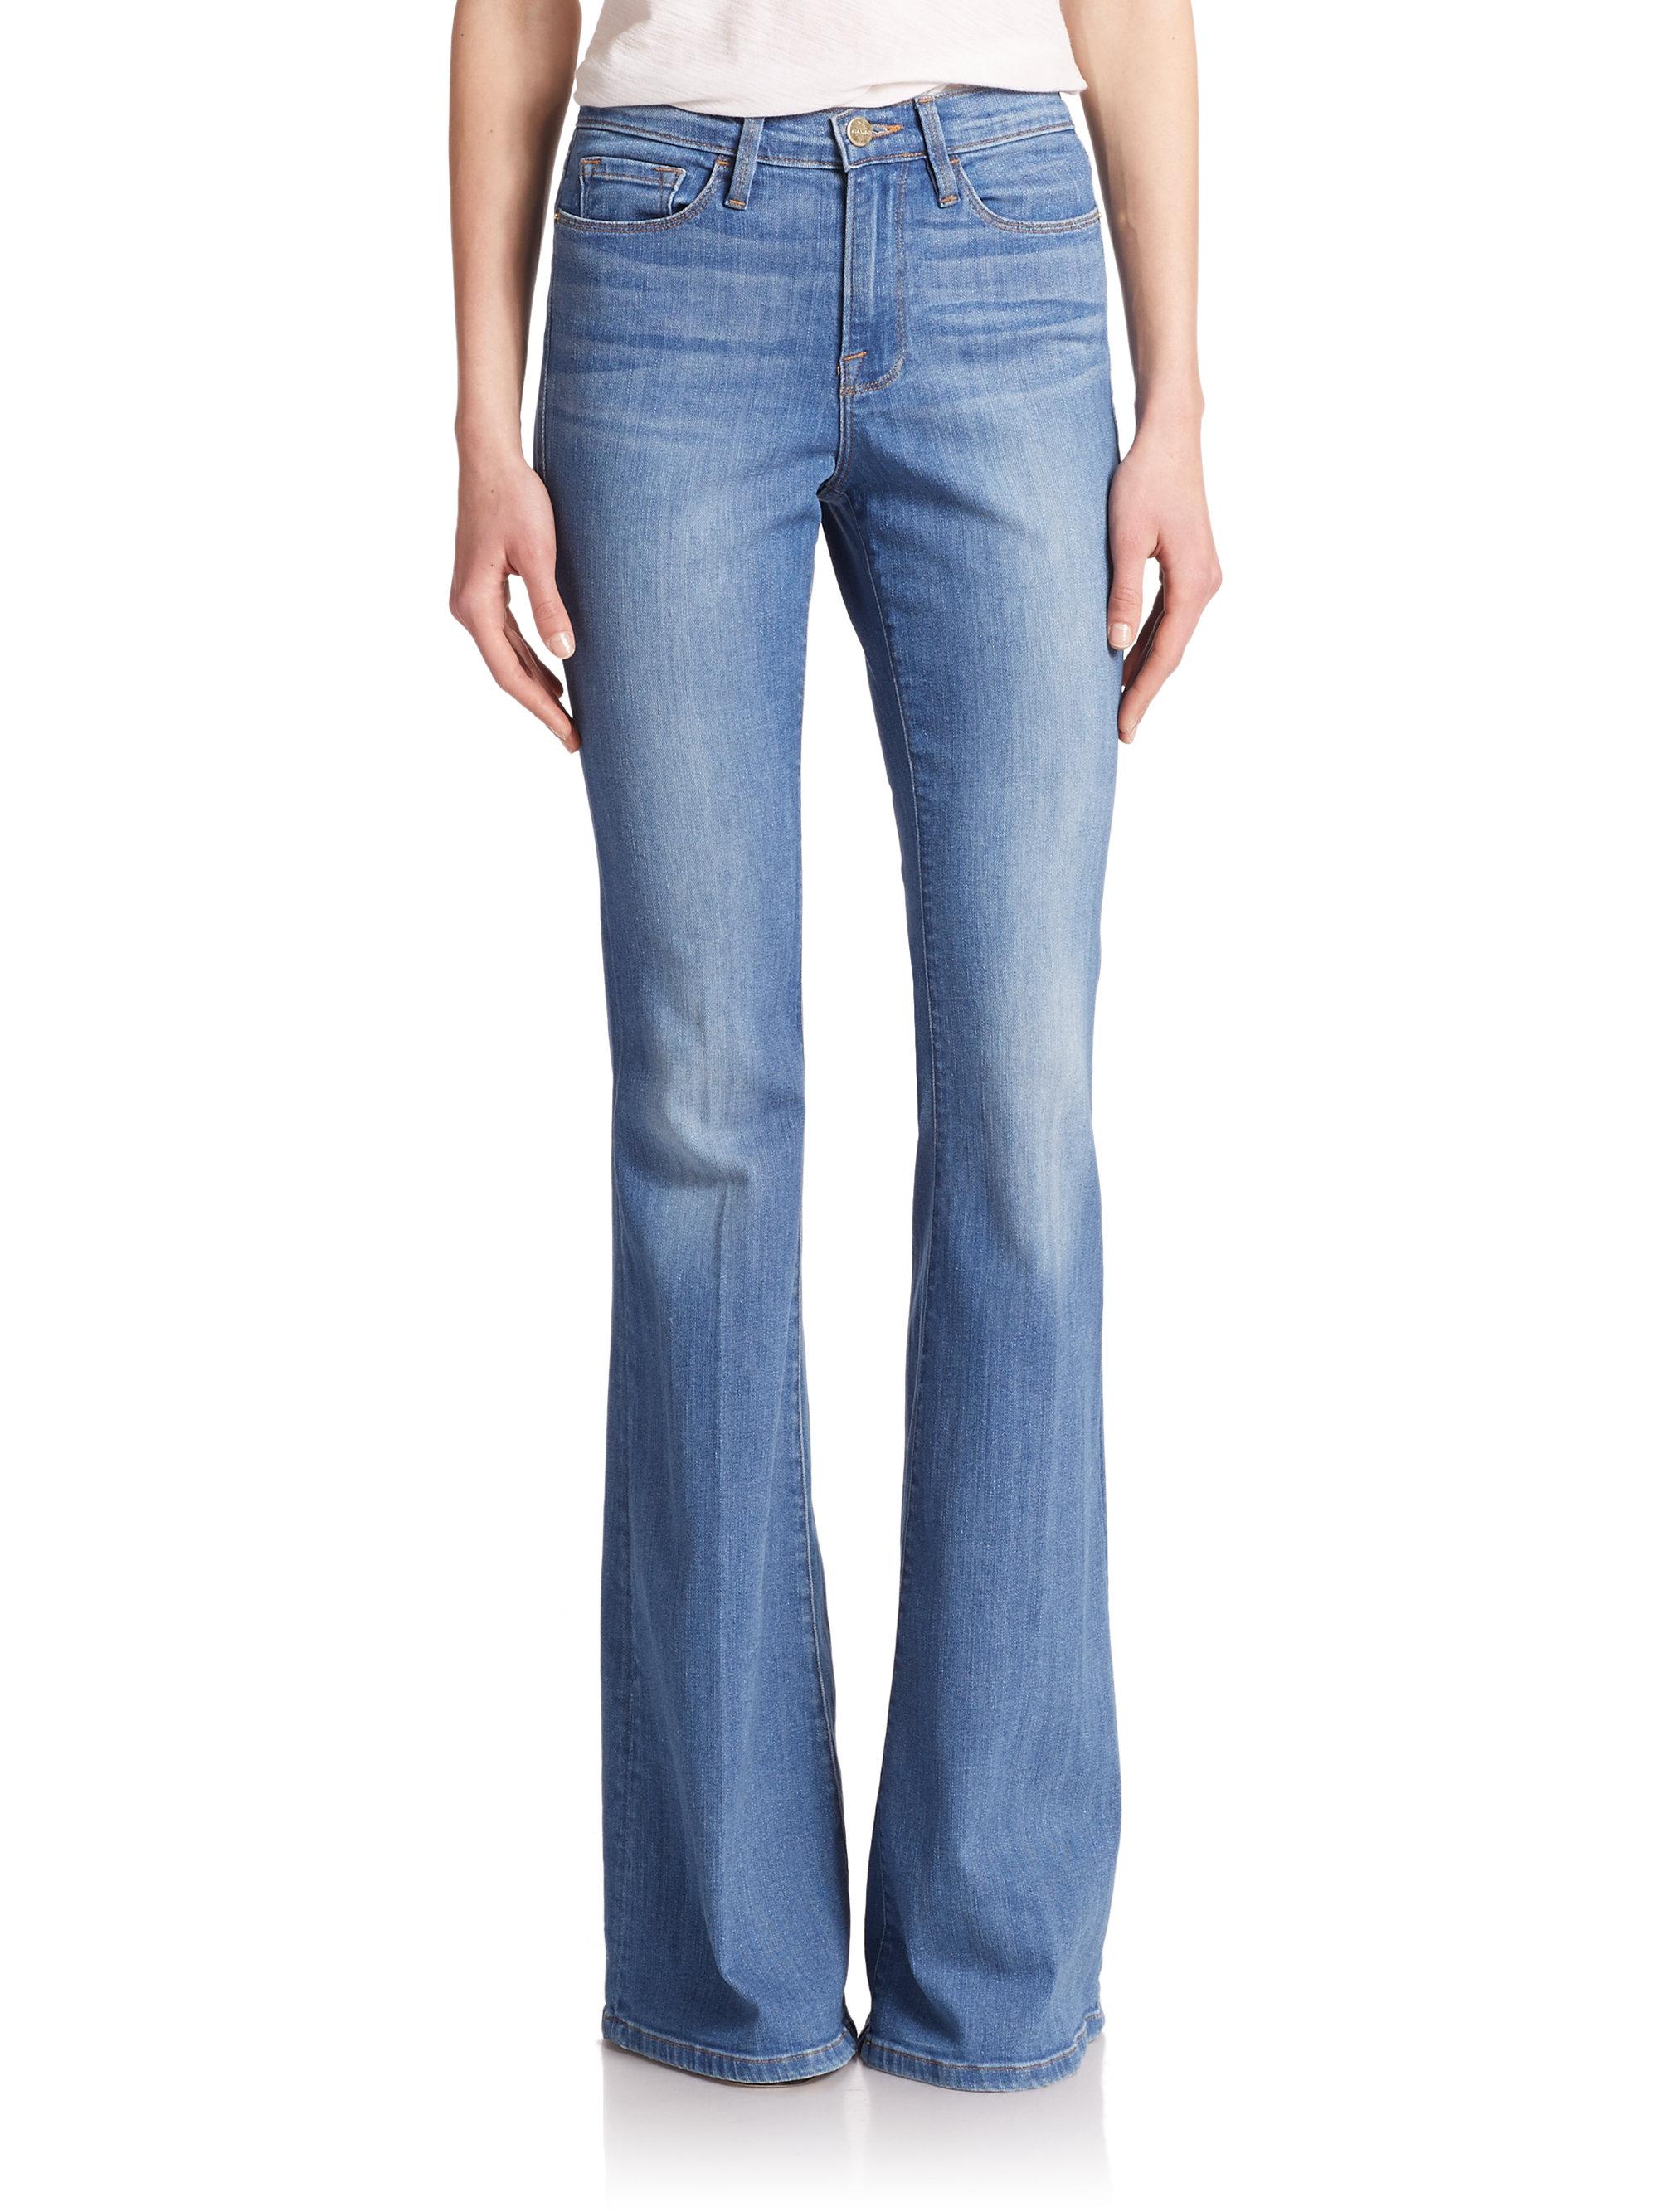 Lyst - Frame Le Forever Karlie Supermodel Length Flared Jeans in Blue